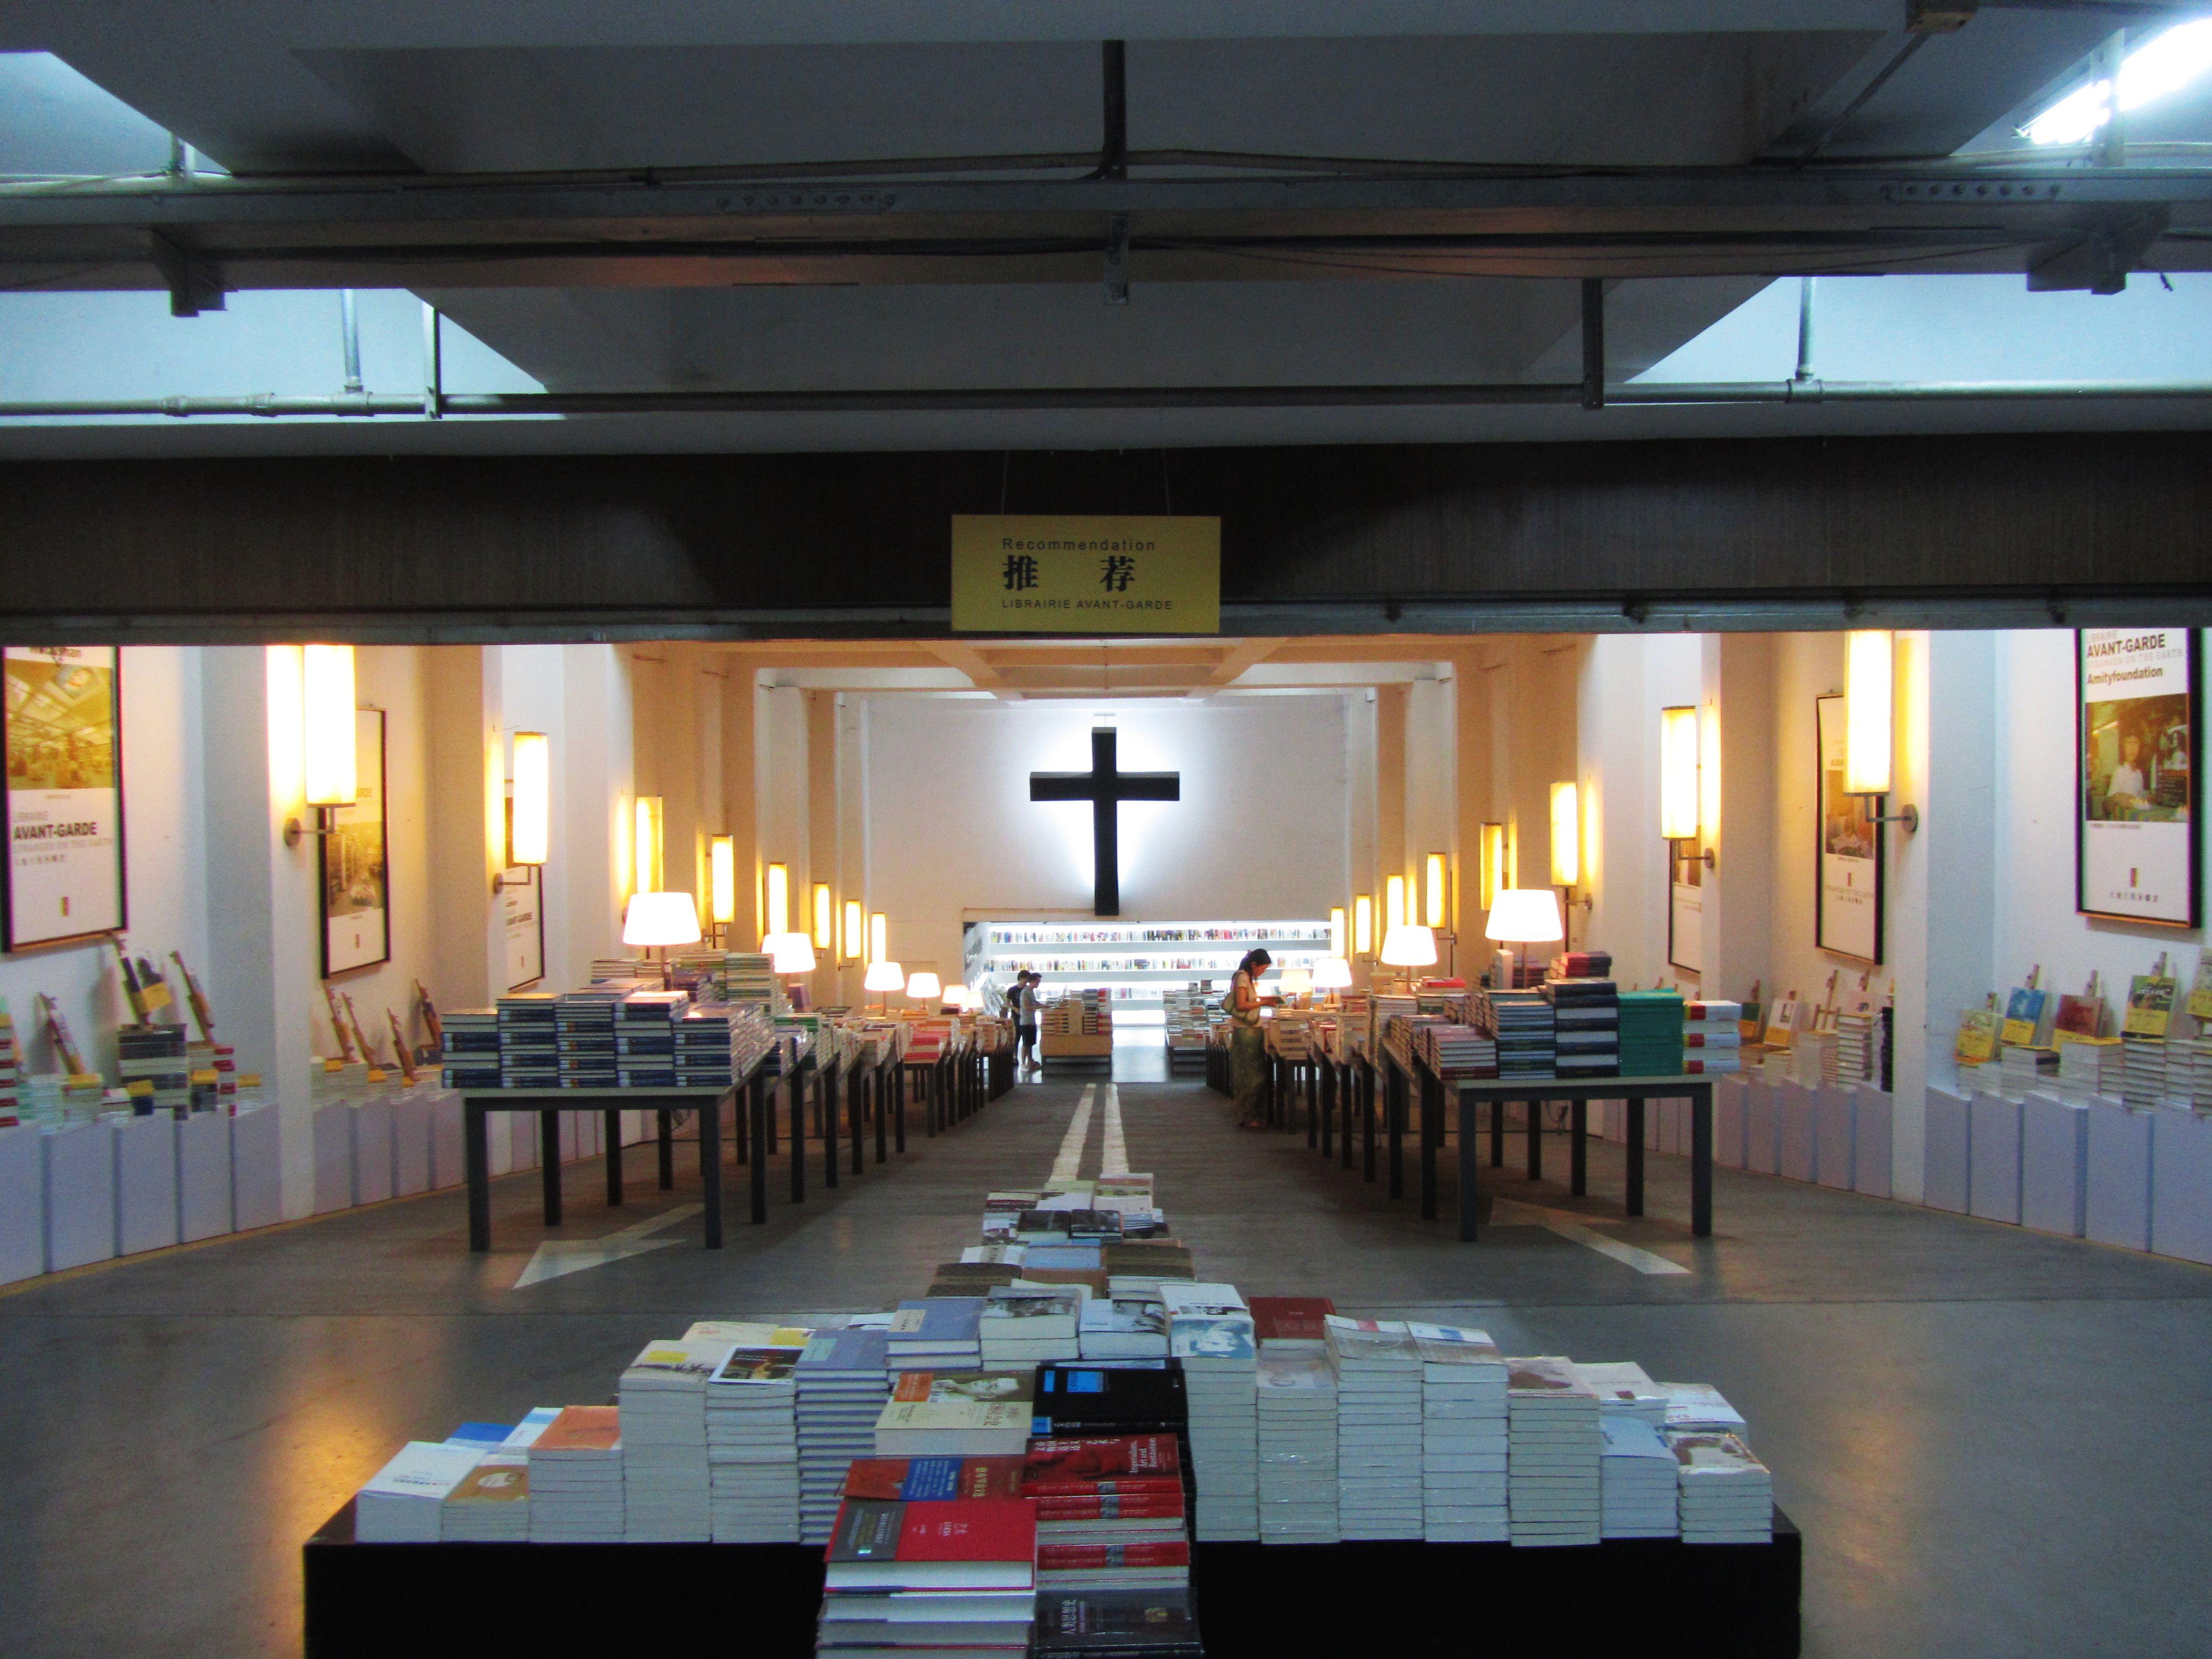 Librairie Avant-Garde, Nanjing, Cina